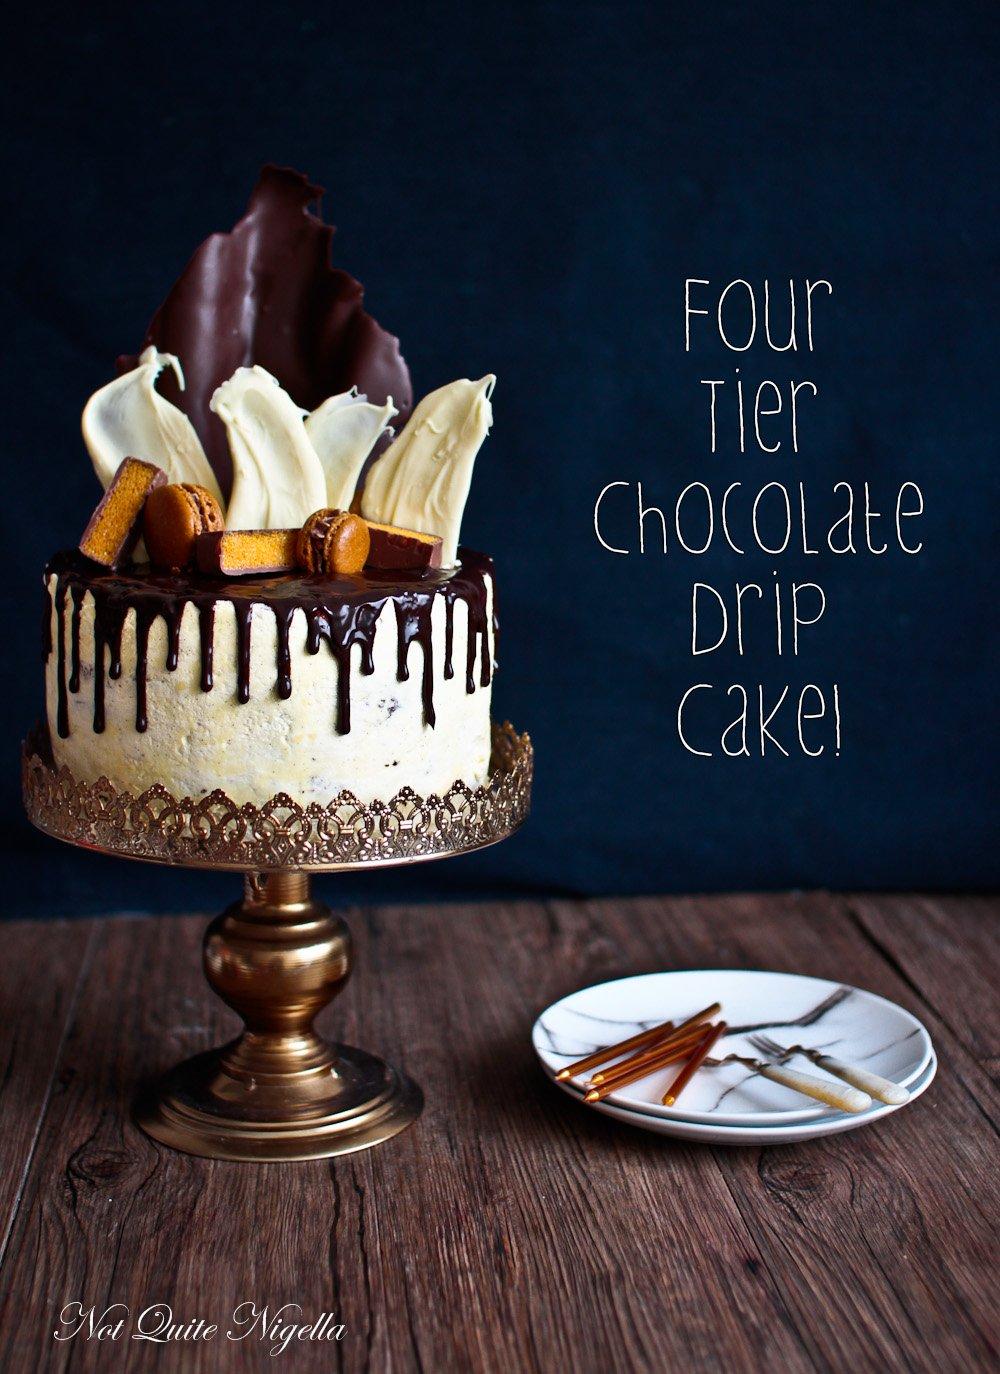 Chocolate Drip Cake Woolworths